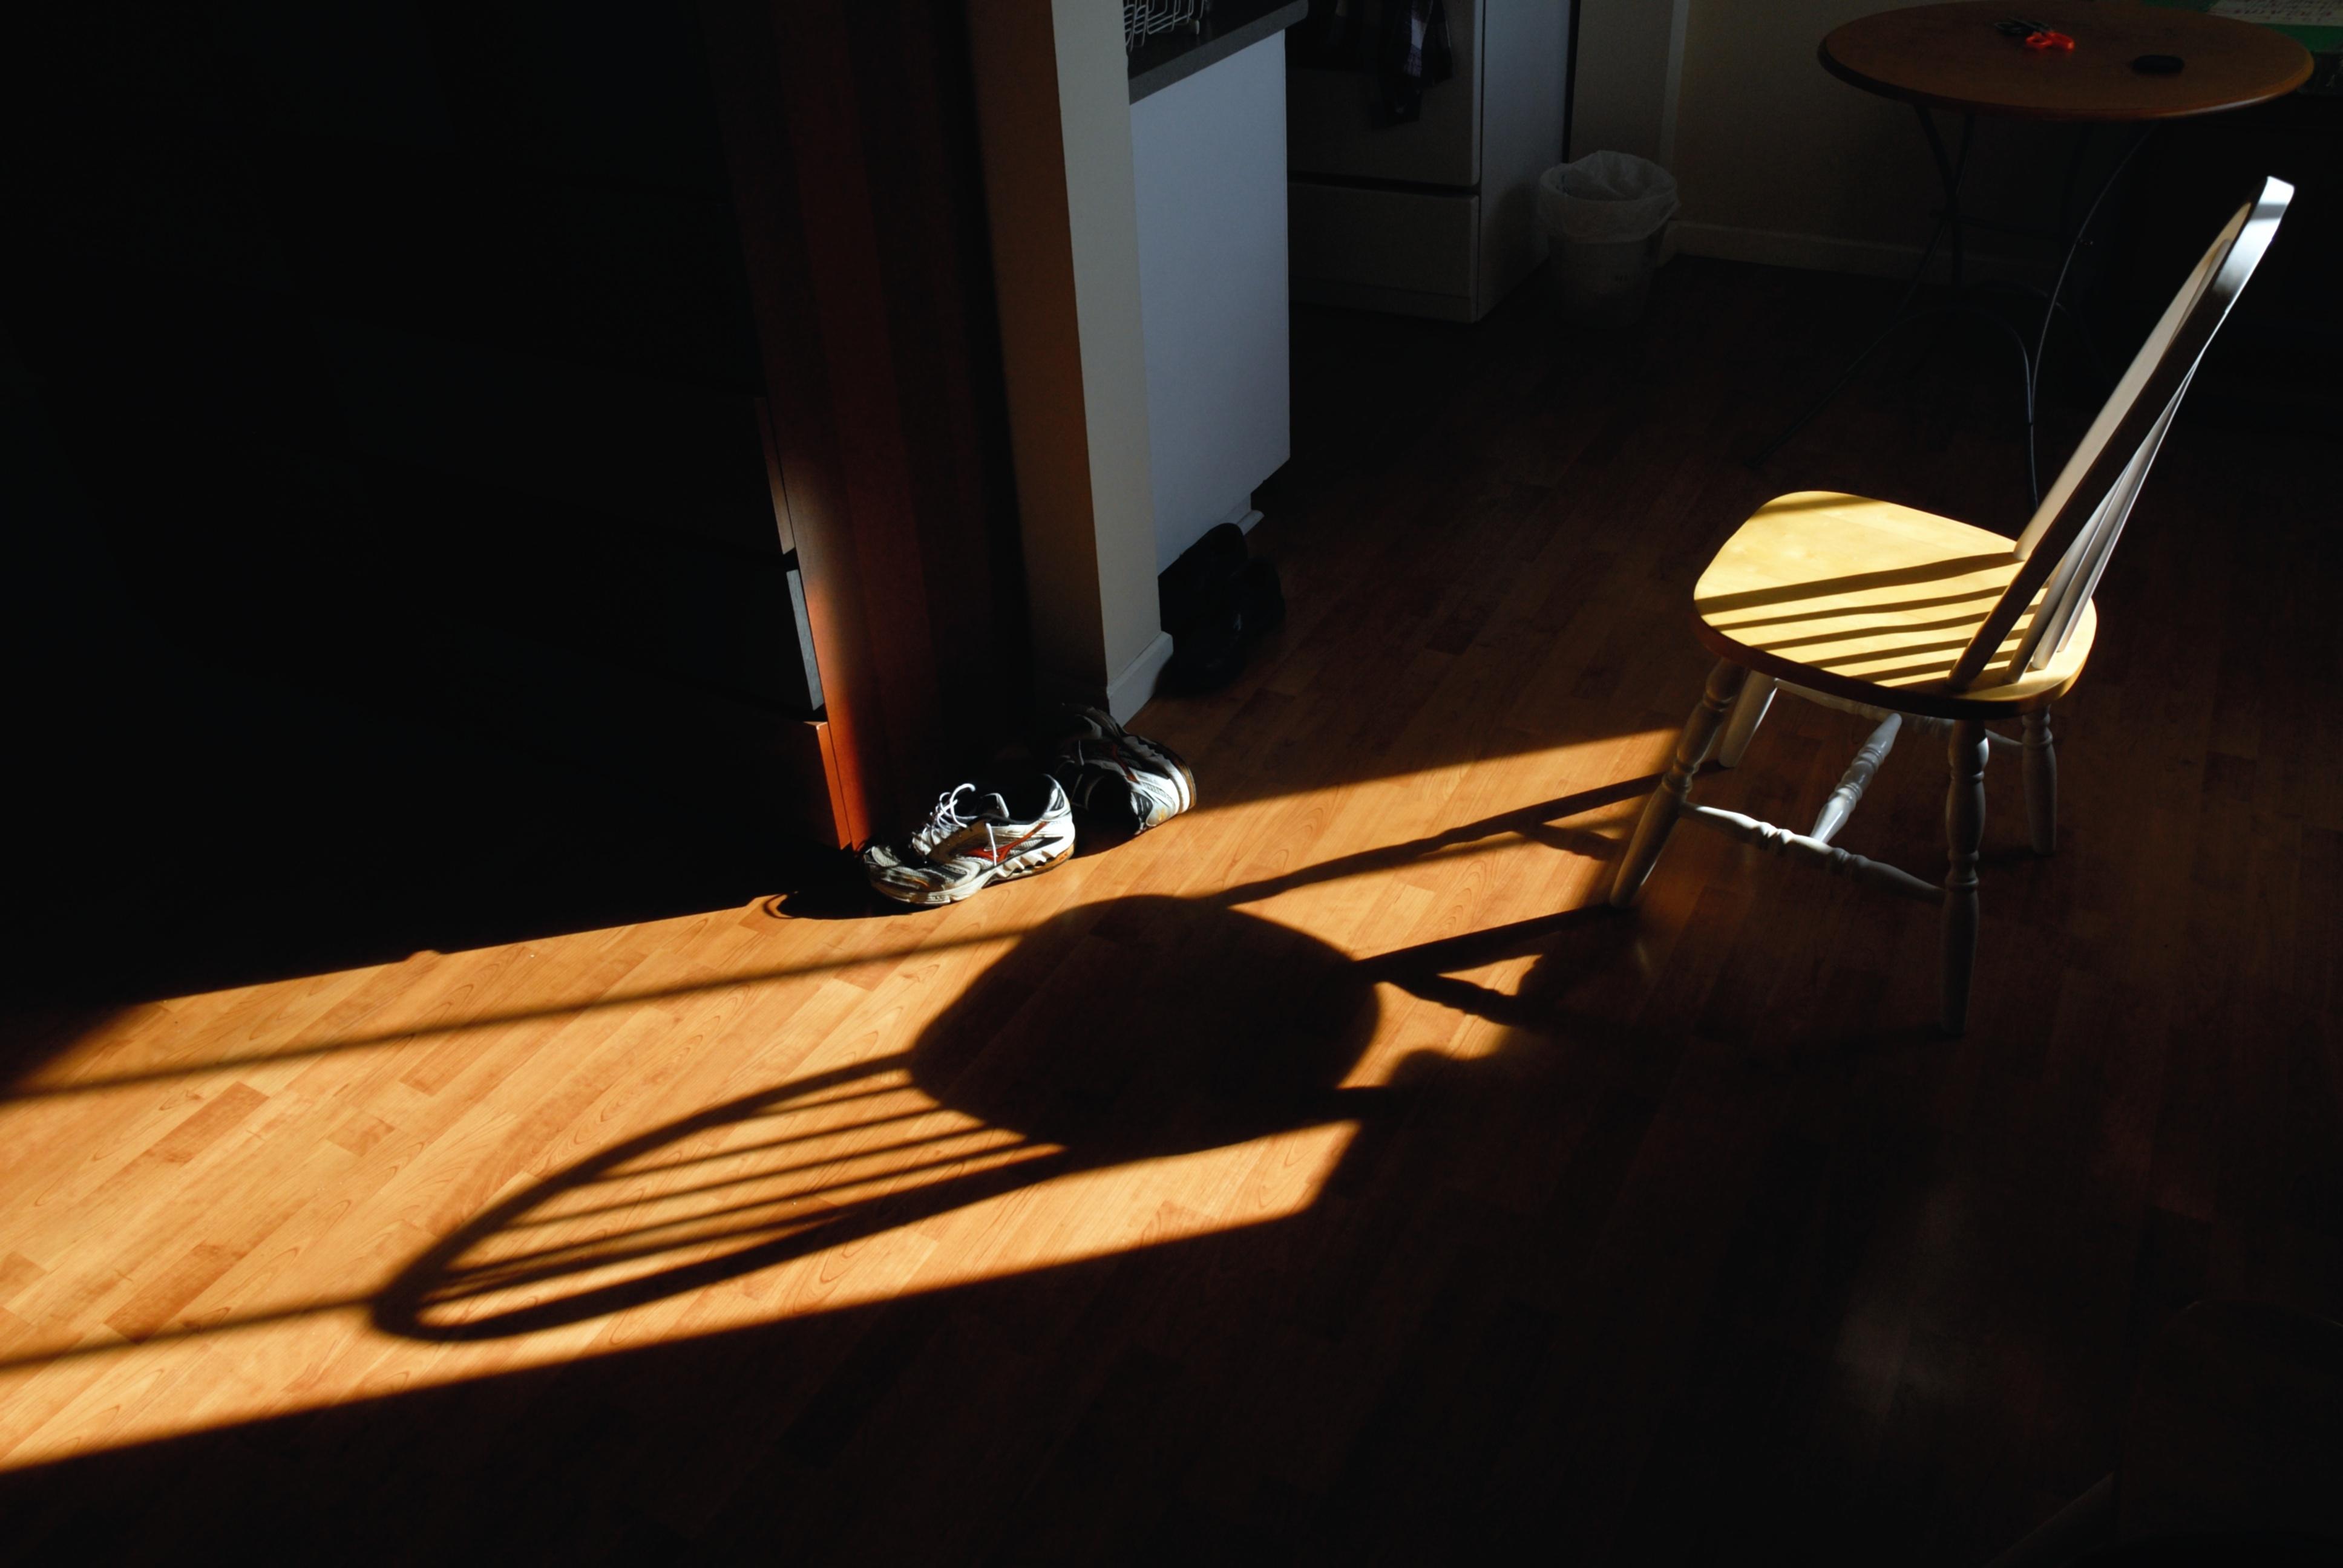 Table Light Wood Guitar Floor Darkness Furniture Lighting Design Shape  String Instrument Plucked String Instruments